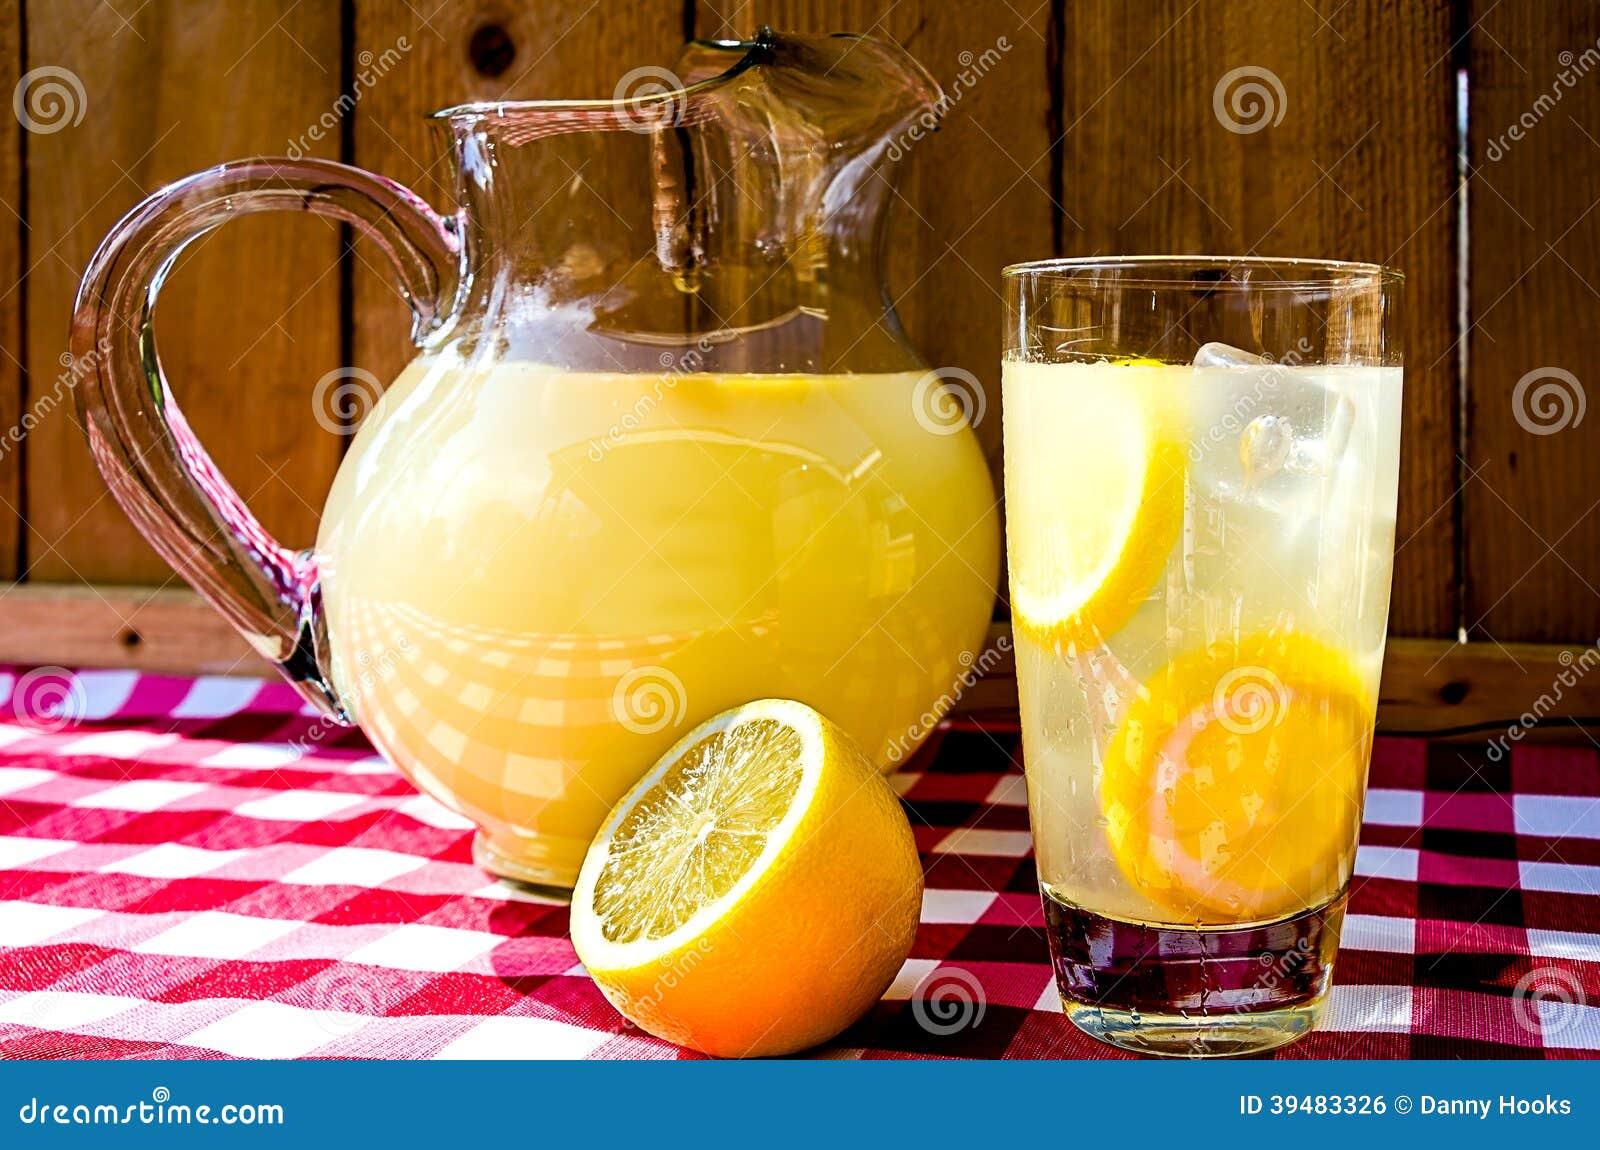 Lemonade And Pitcher Stock Photo Image Of Lemon Sour